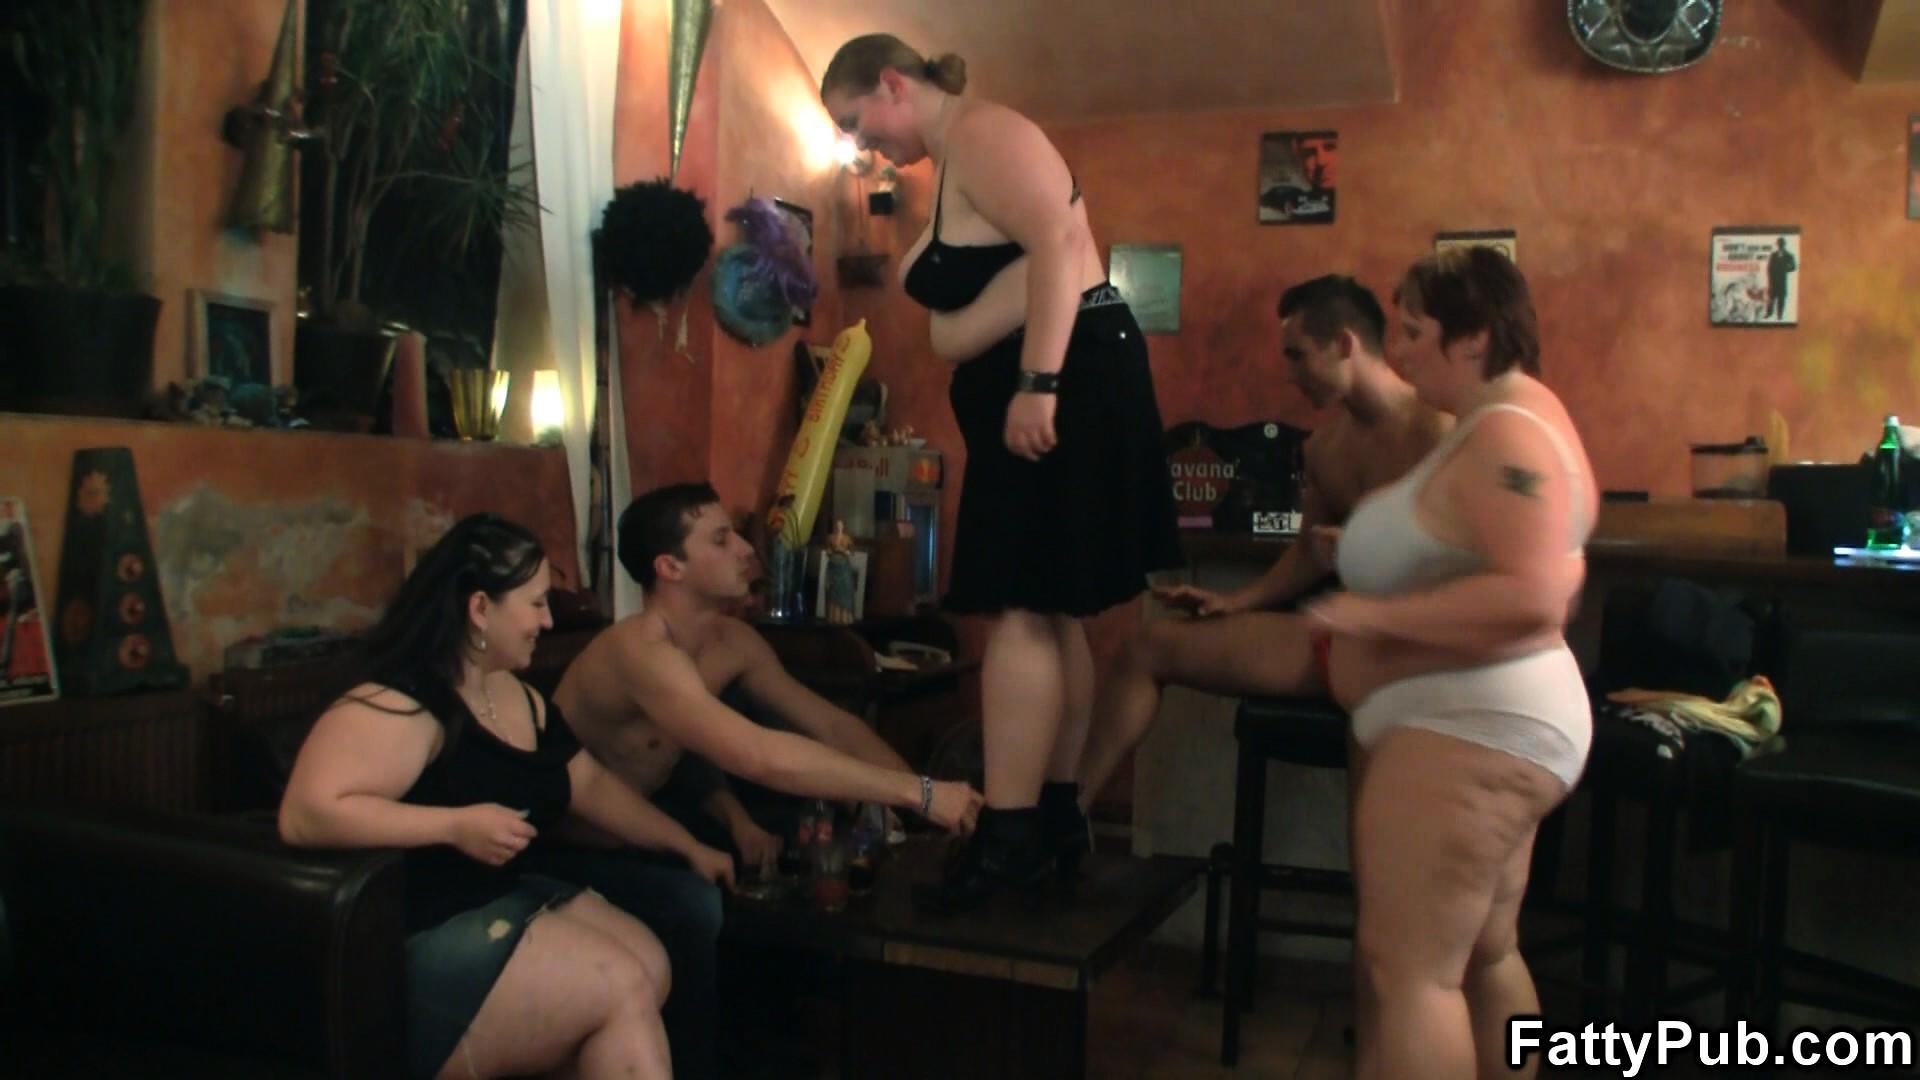 Hot Naked Pics tit sucking wild parties